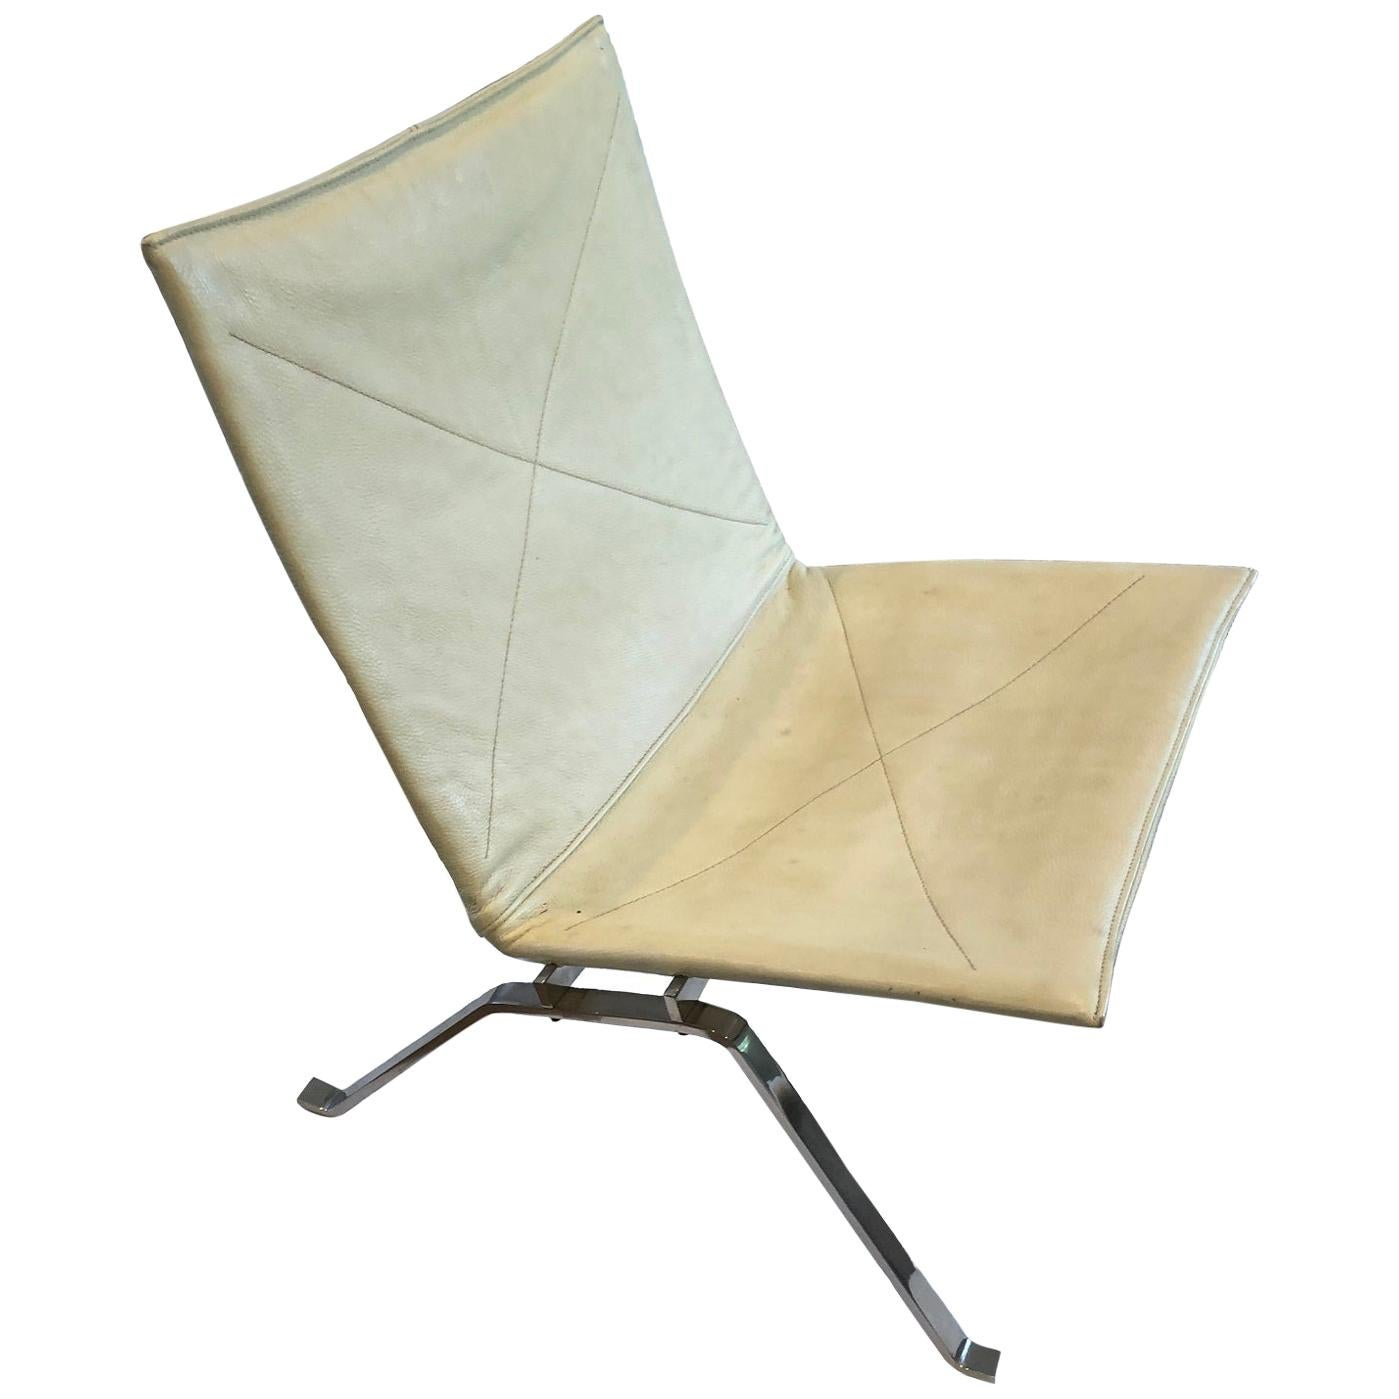 PK22 Poul Kjaerholm White Leather Upholstered Side Chair